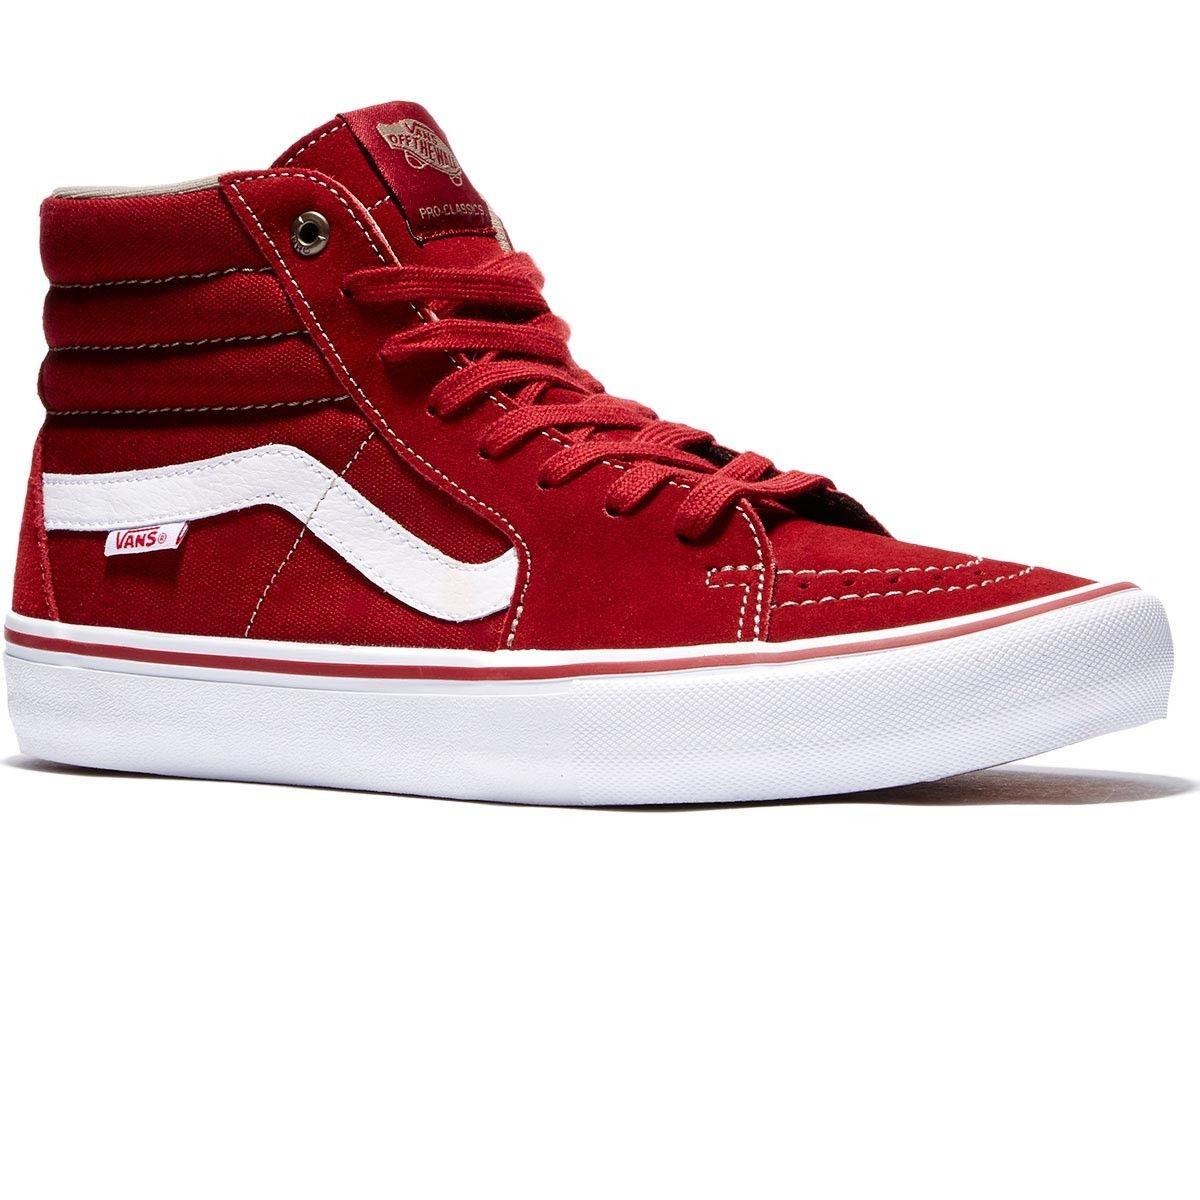 2d2b09f7b8 Vans Sk8-Hi Pro Shoes - Red Dahlia White - 8.0